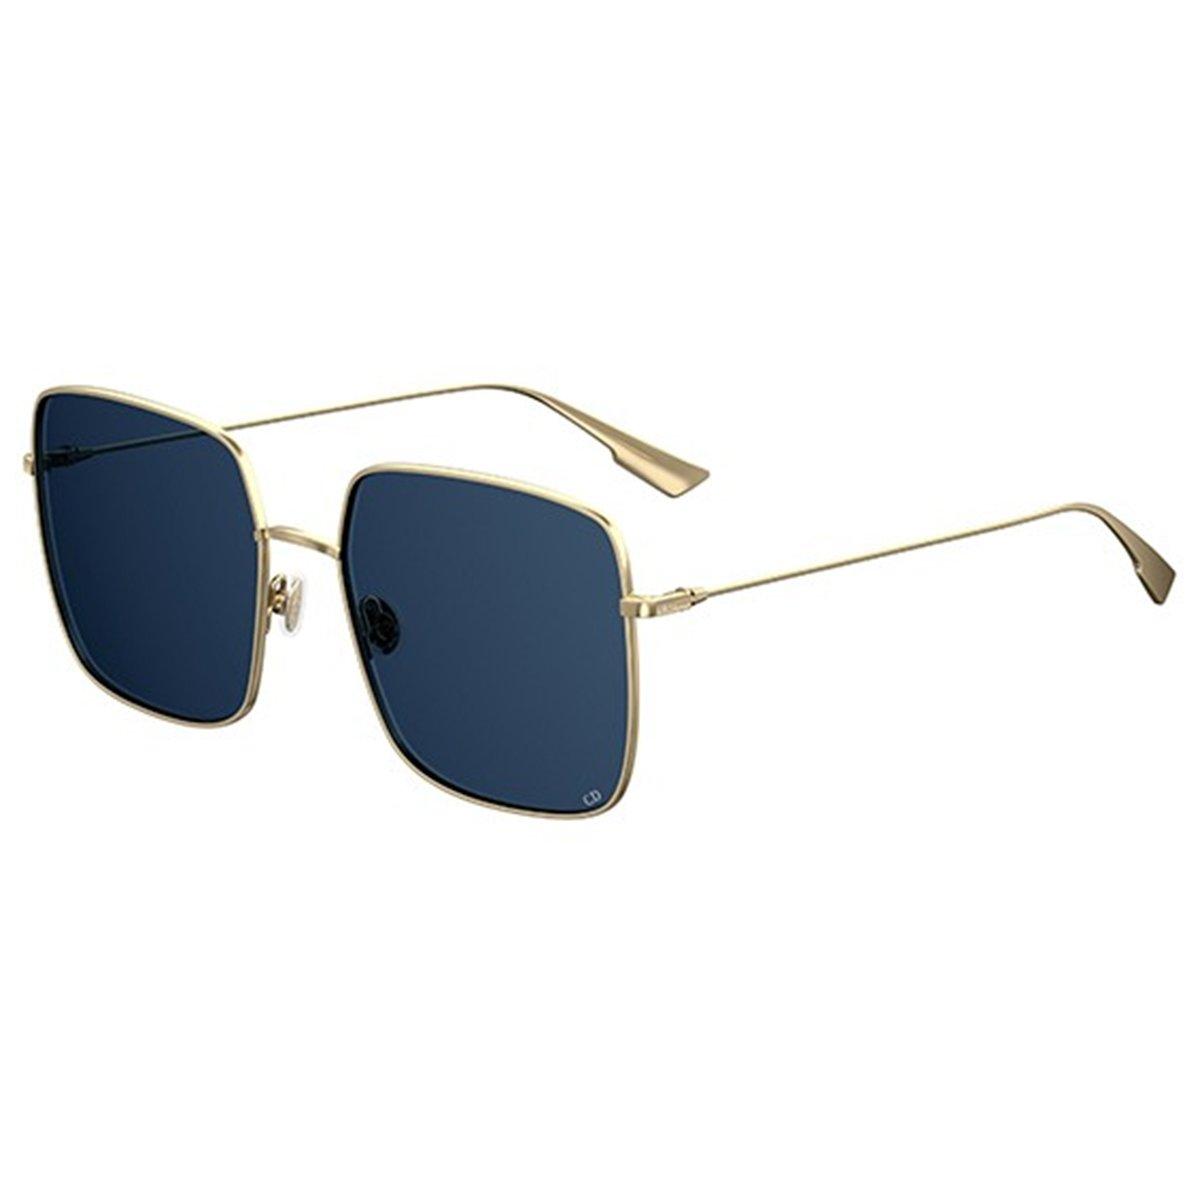 f56d0bb41 Compre Óculos de Sol Dior Stellaire 1 em 10X | Tri-Jóia Shop